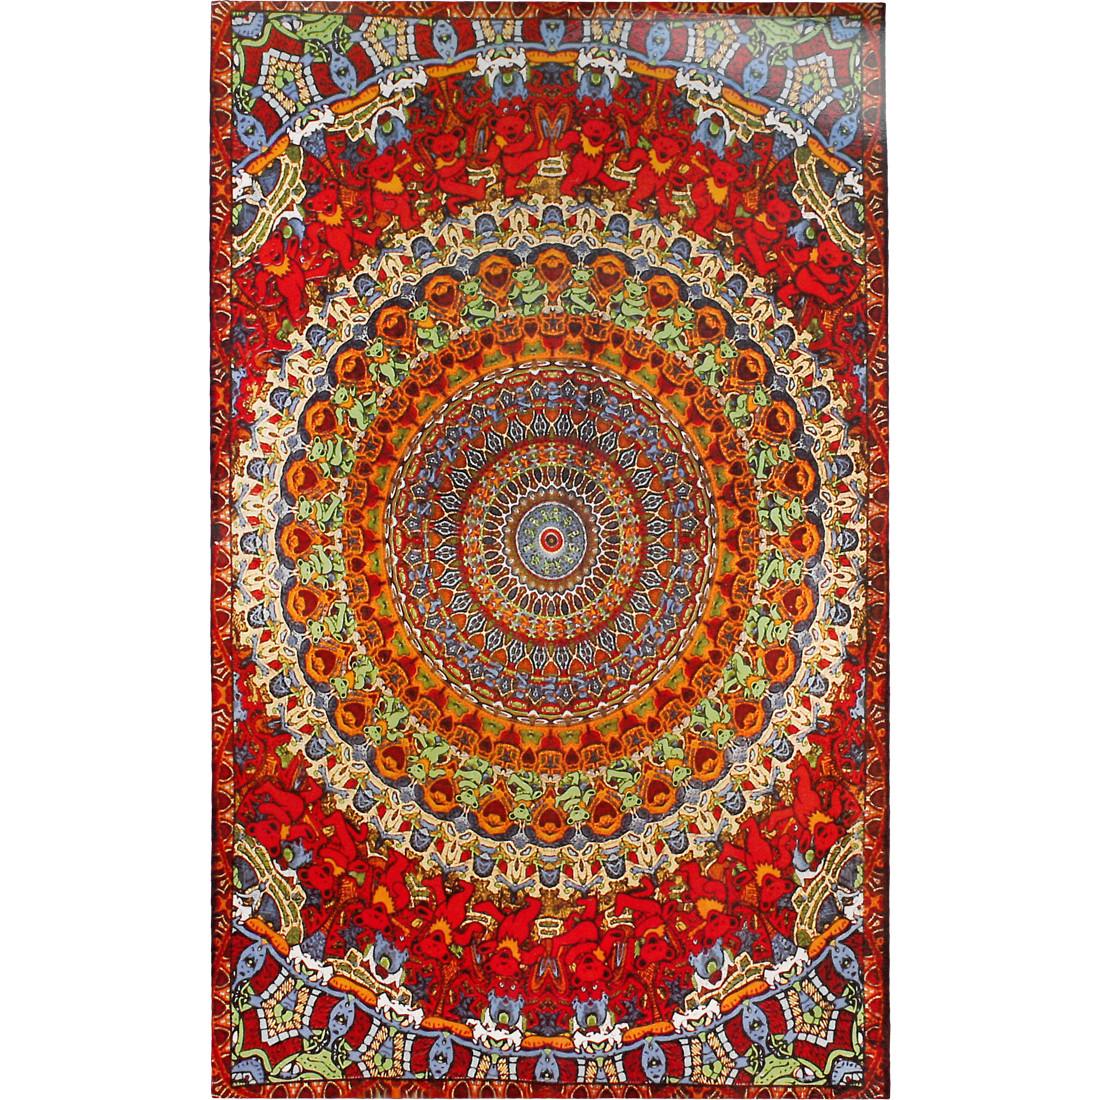 GD Bear Vibrations Tapestry